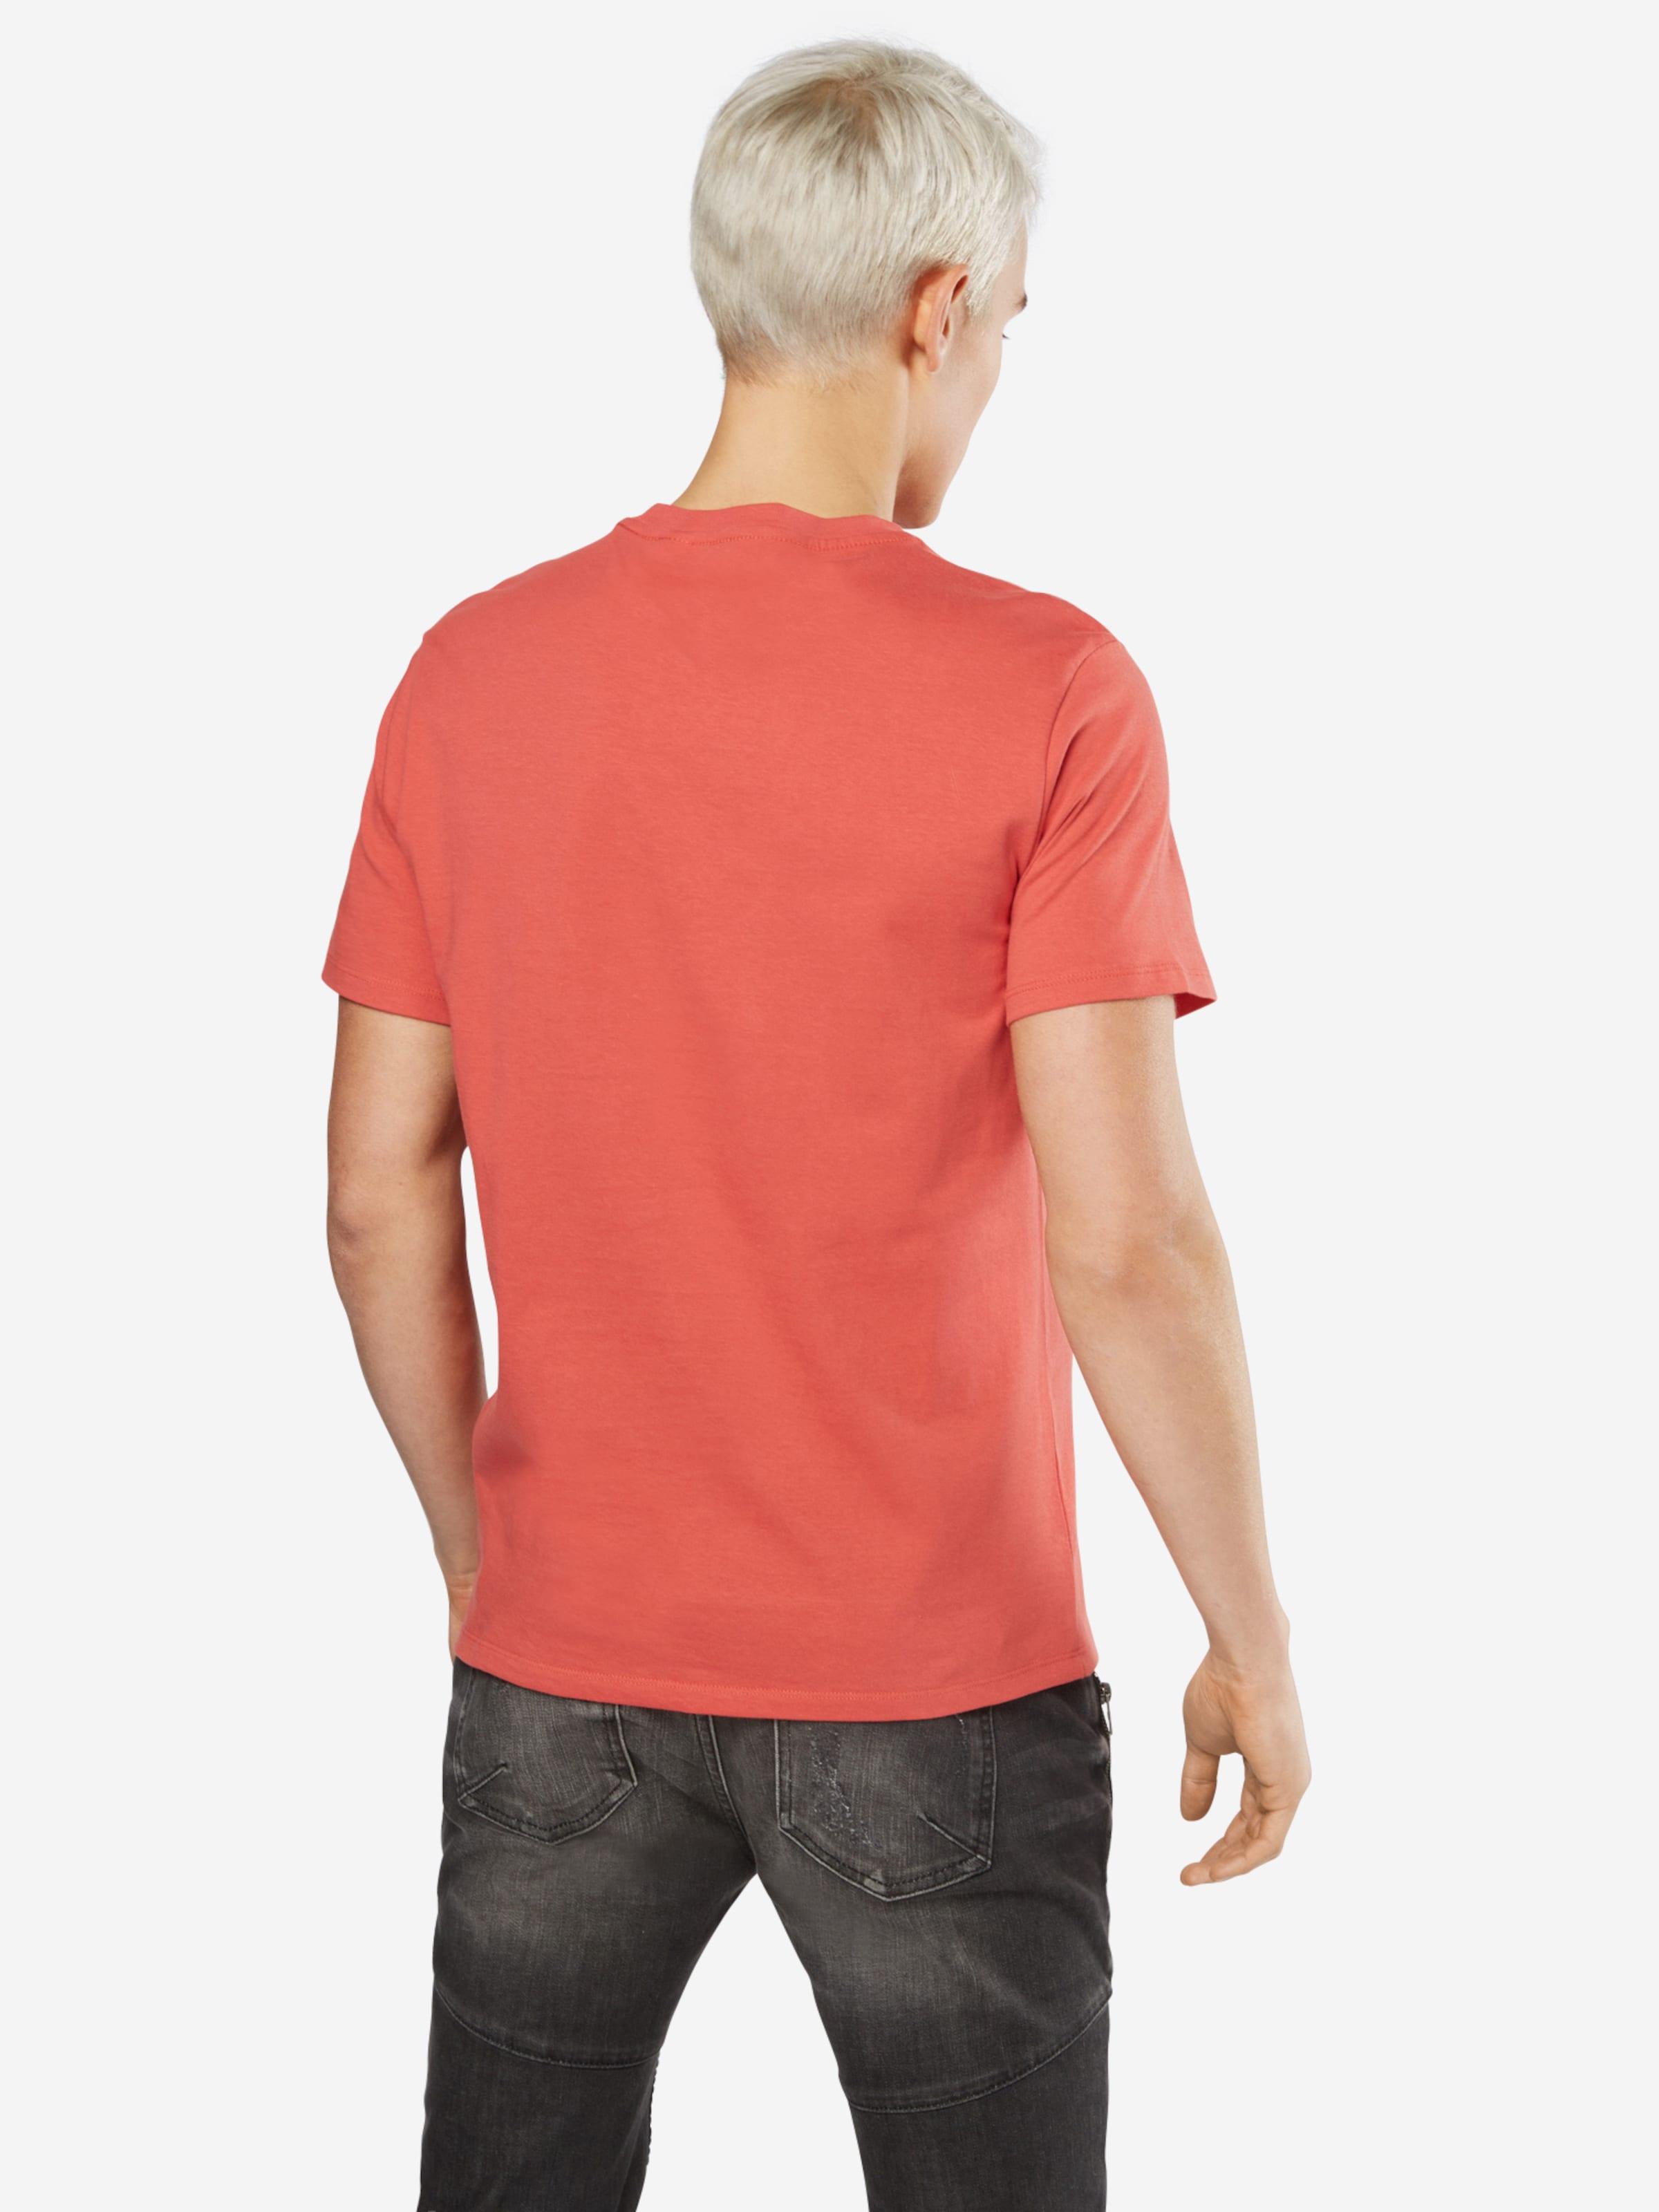 LEVI'S T-Shirt 'GRAPHIC SET-IN NECK 2' Offizielle Seite Steckdose Echte ATHHGAB02